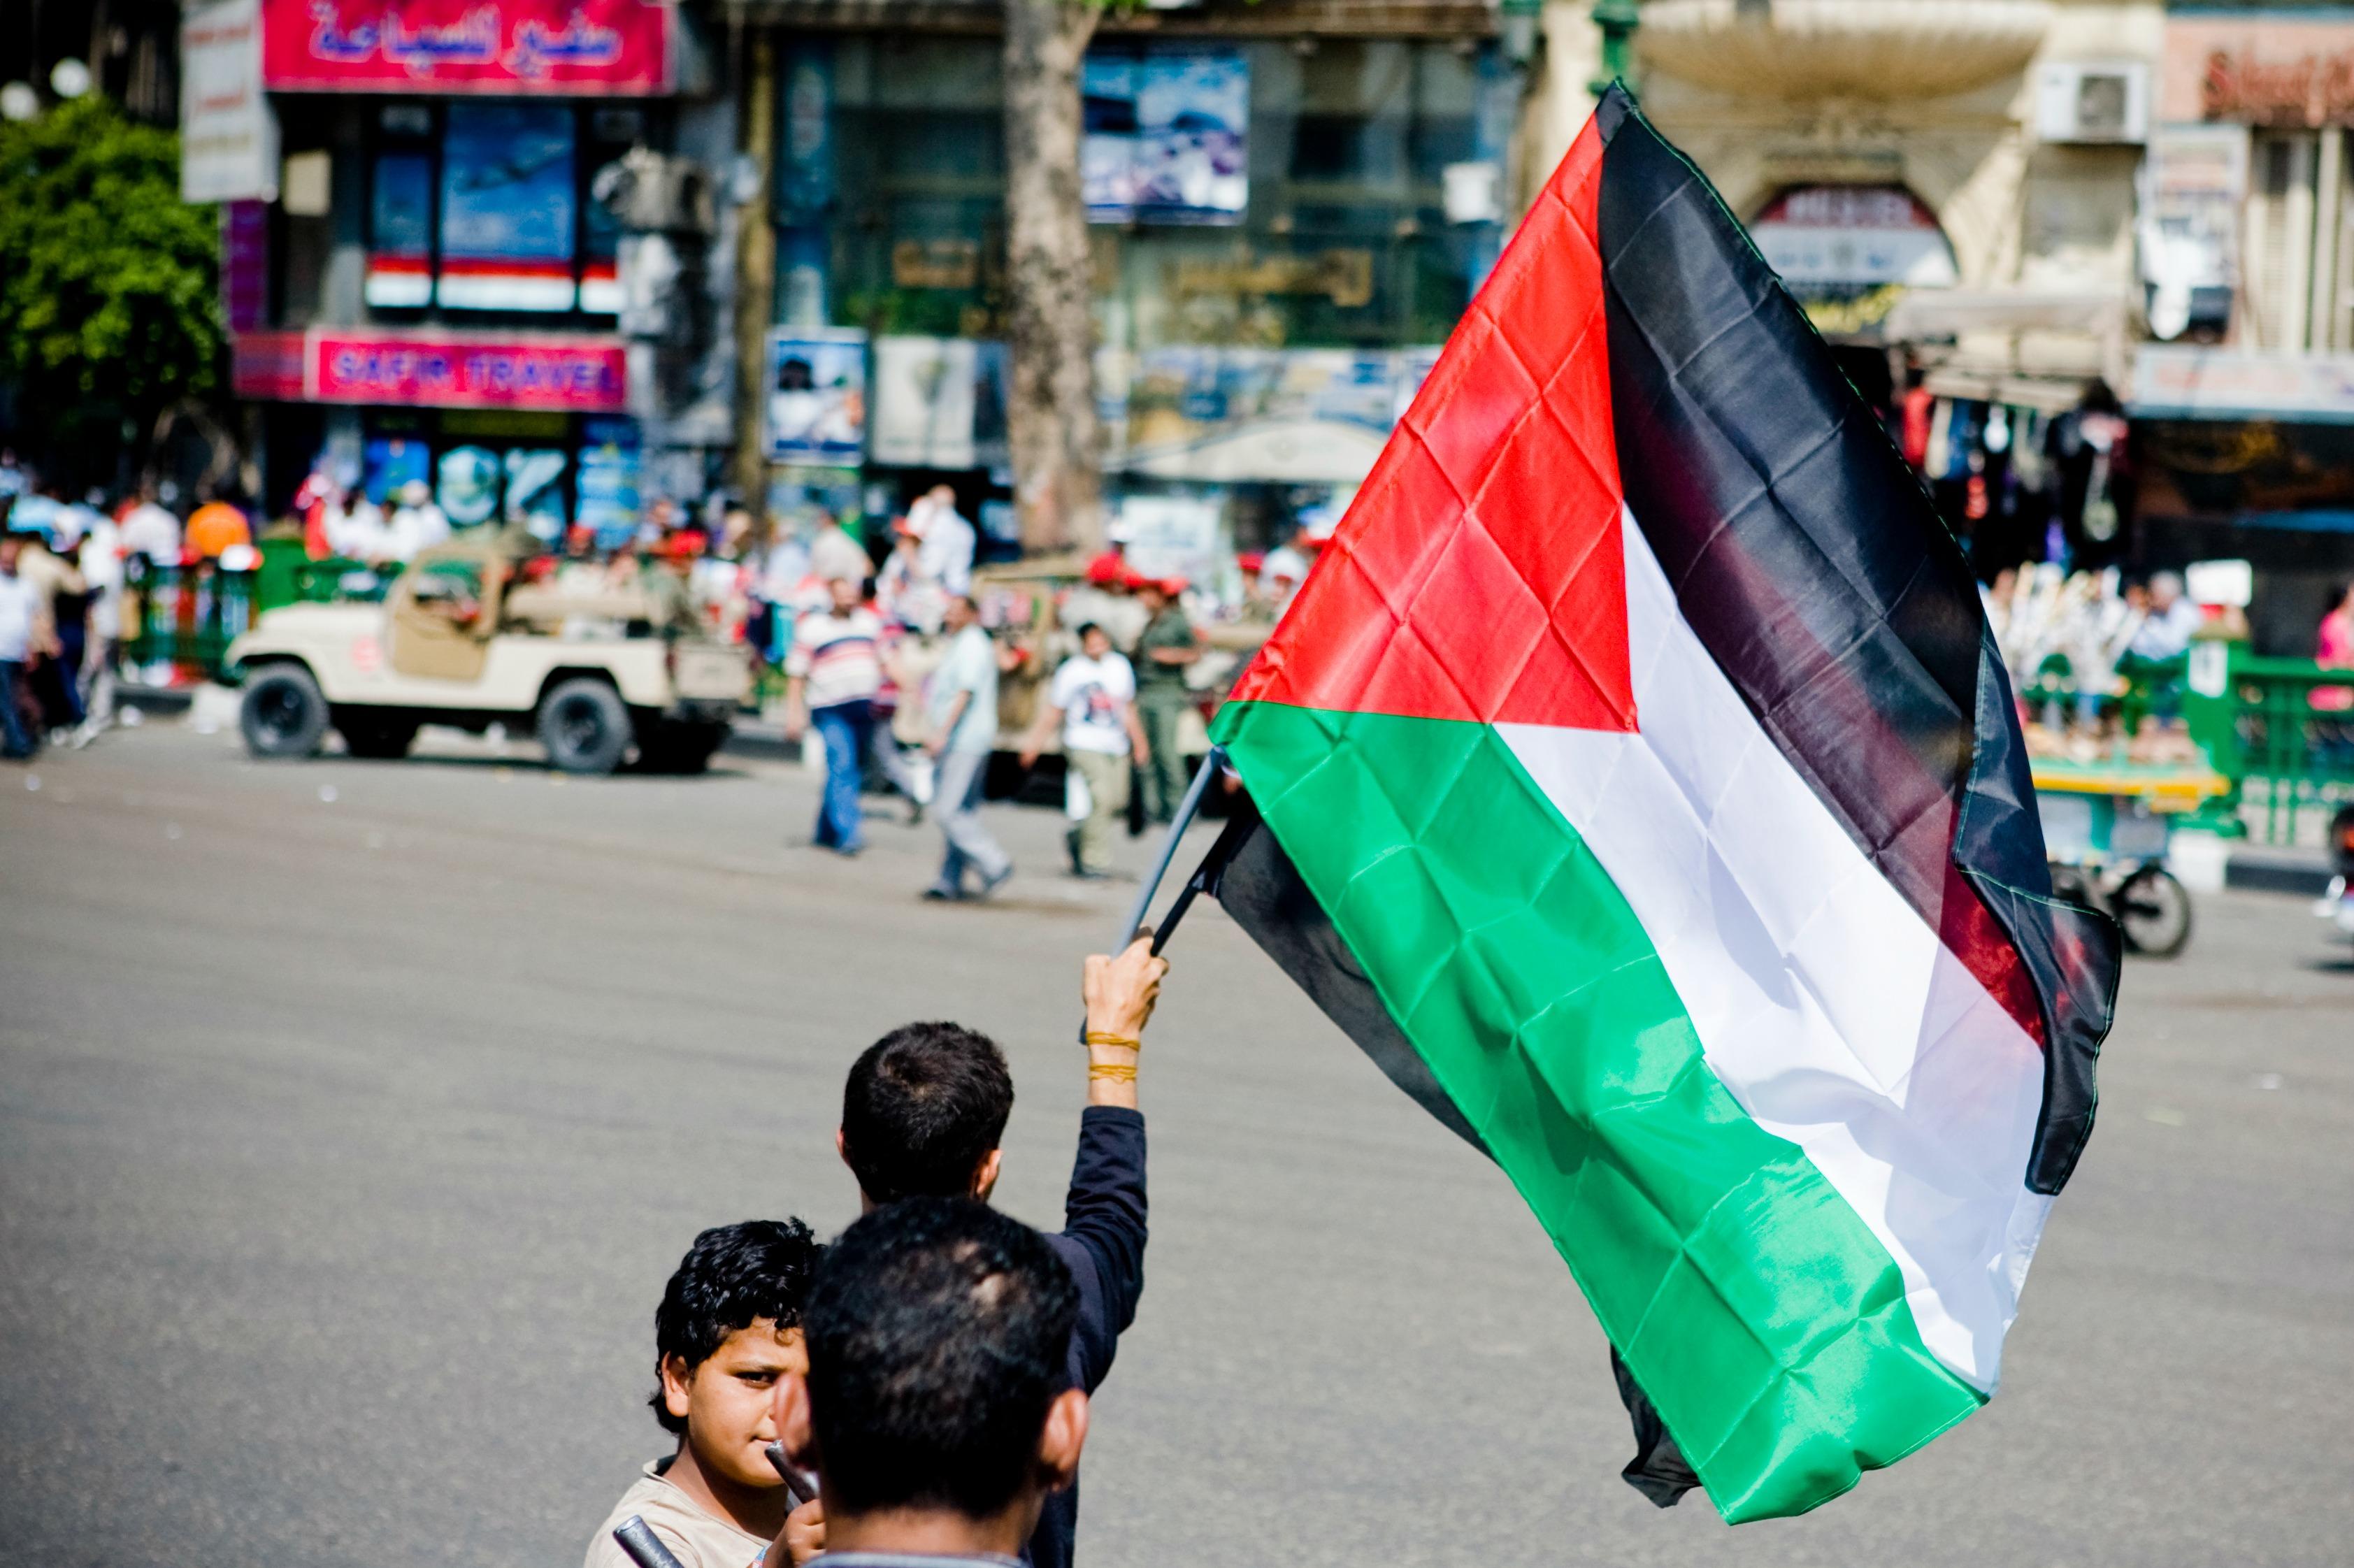 [Hossam el-Hamalawy/Flickr]